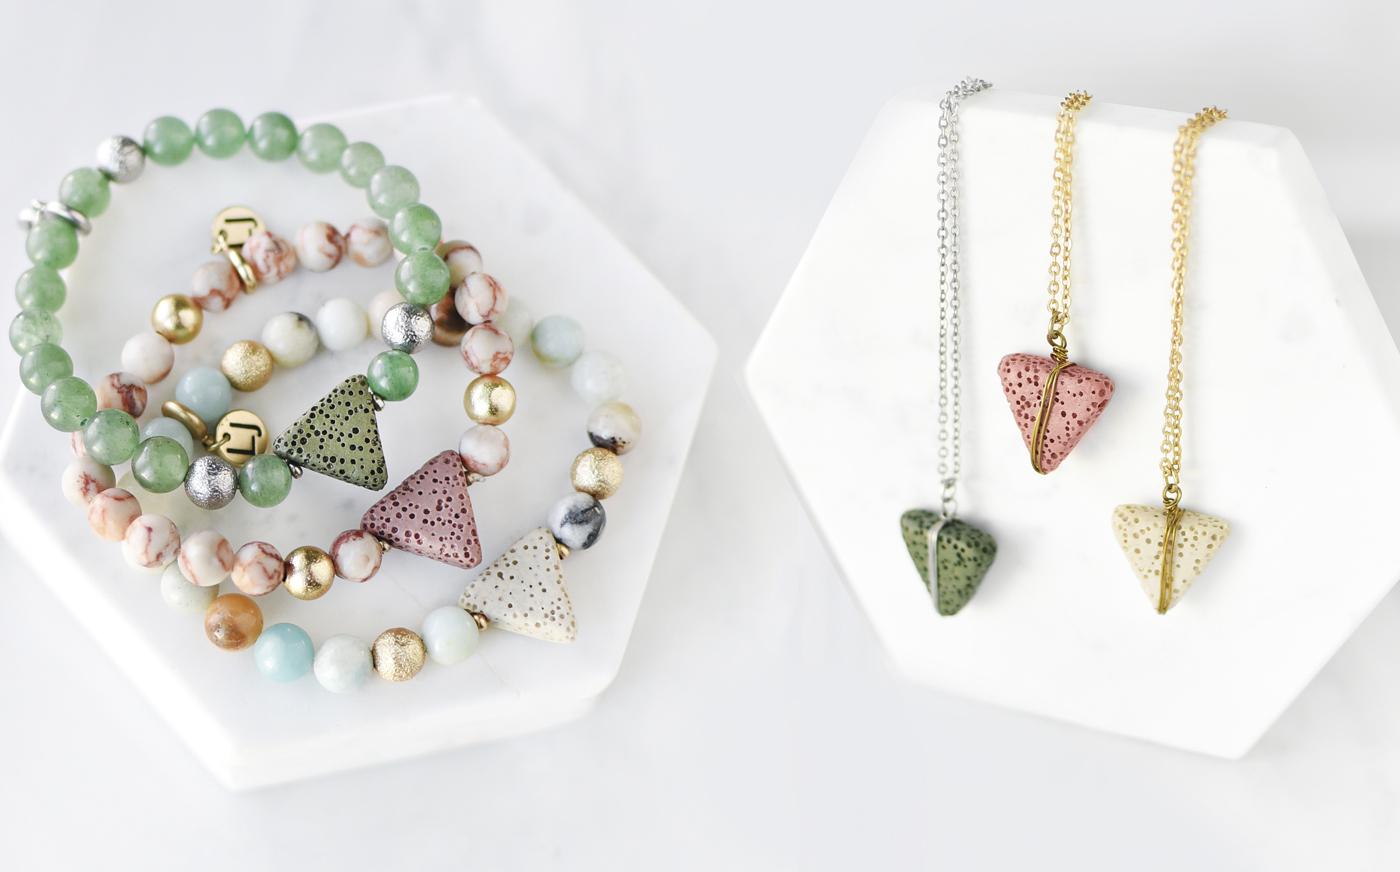 Essential Oil Pyramid Necklaces & Bracelets